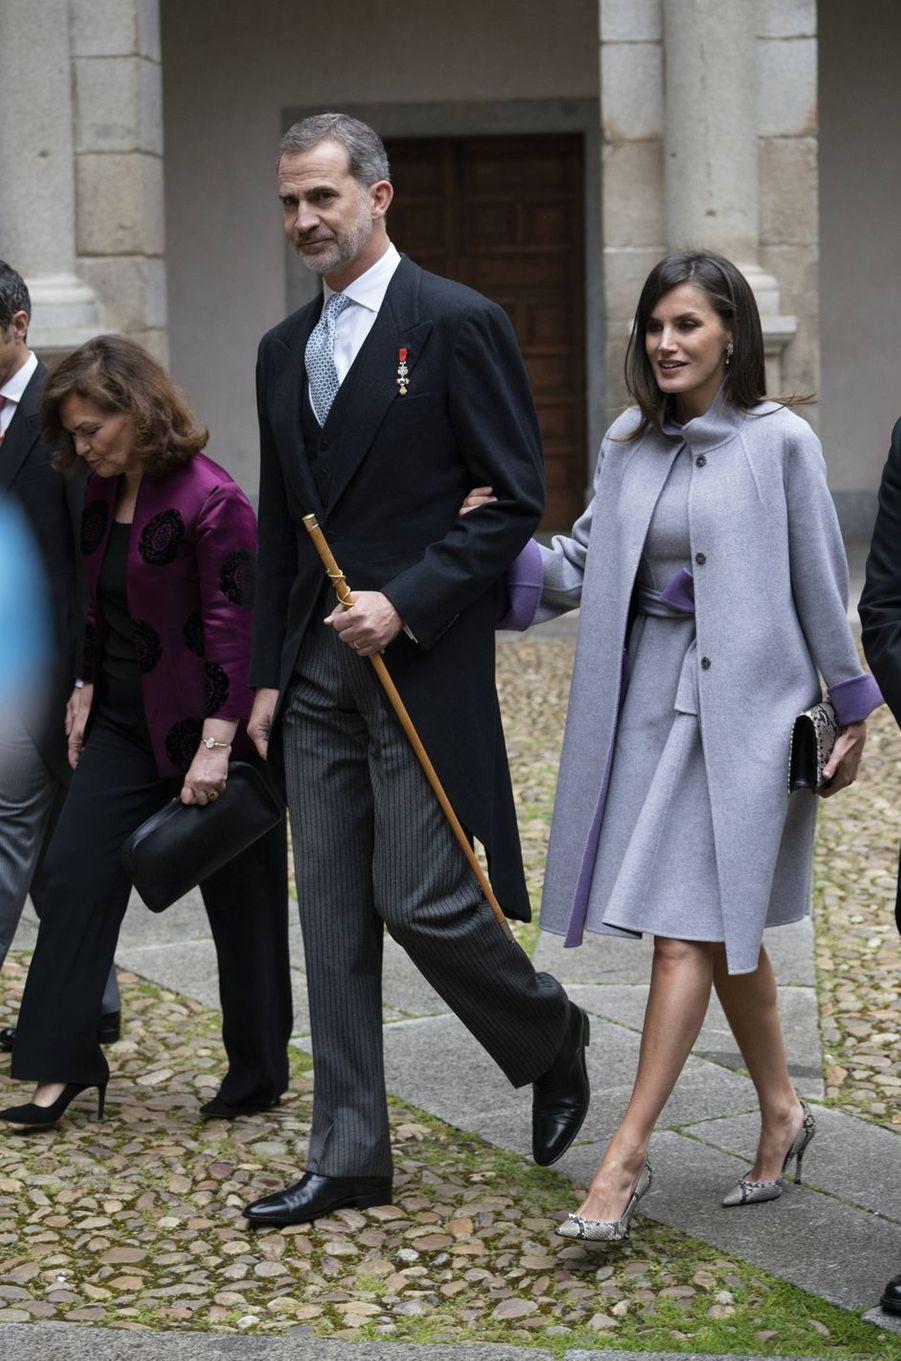 La reine Letizia, en Carolina Herrera, et le roi Felipe VI d'Espagne à Alcalá de Henares, le 23 avril 2019